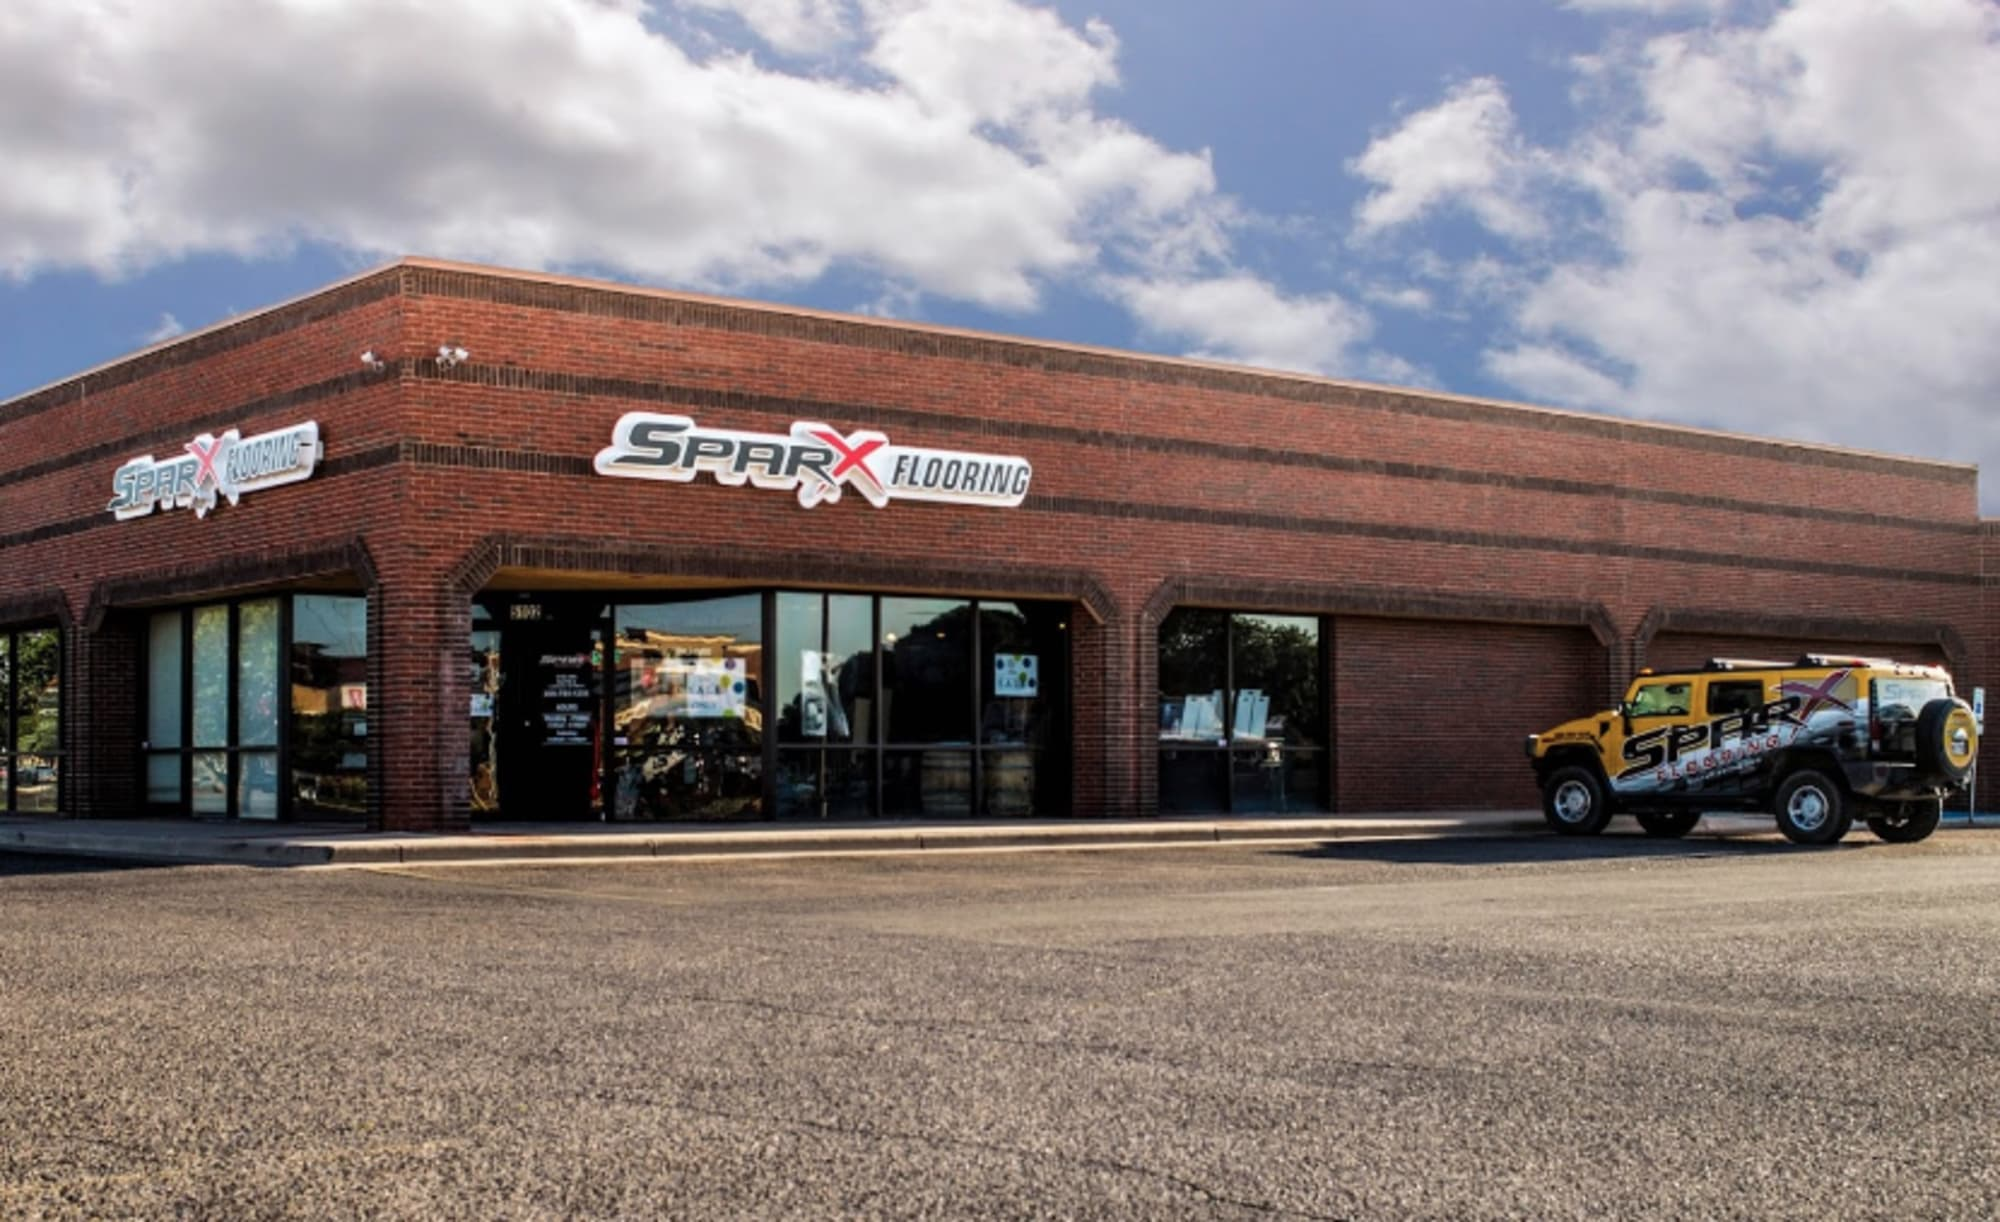 Sparx Flooring - 5102 60th St Lubbock, TX 79414